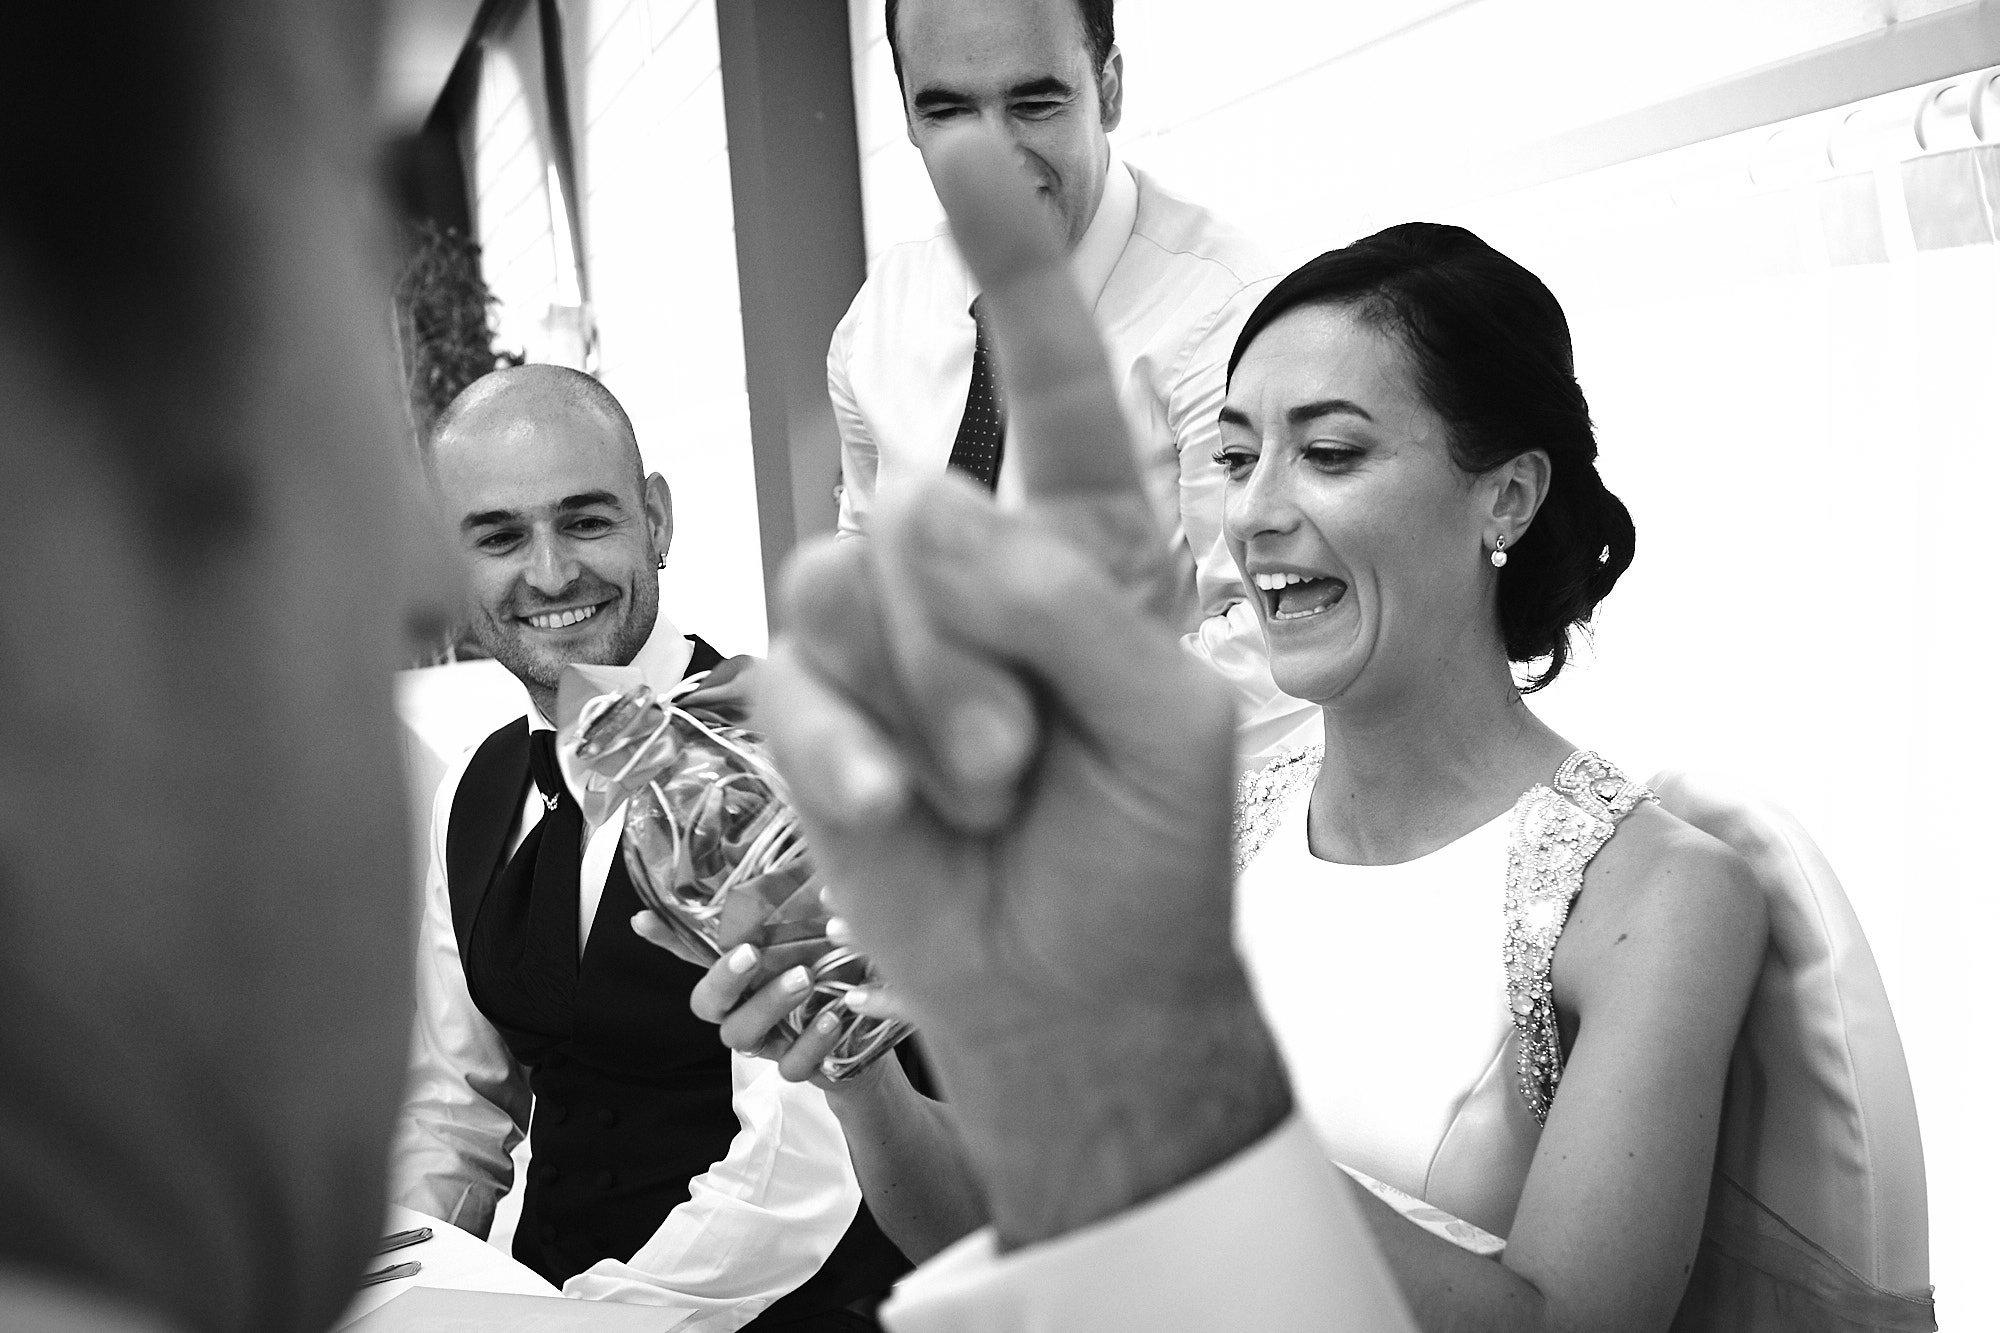 boda real en hotel restaurnte olimpo isla cantabria www.fabriziomaulella.com